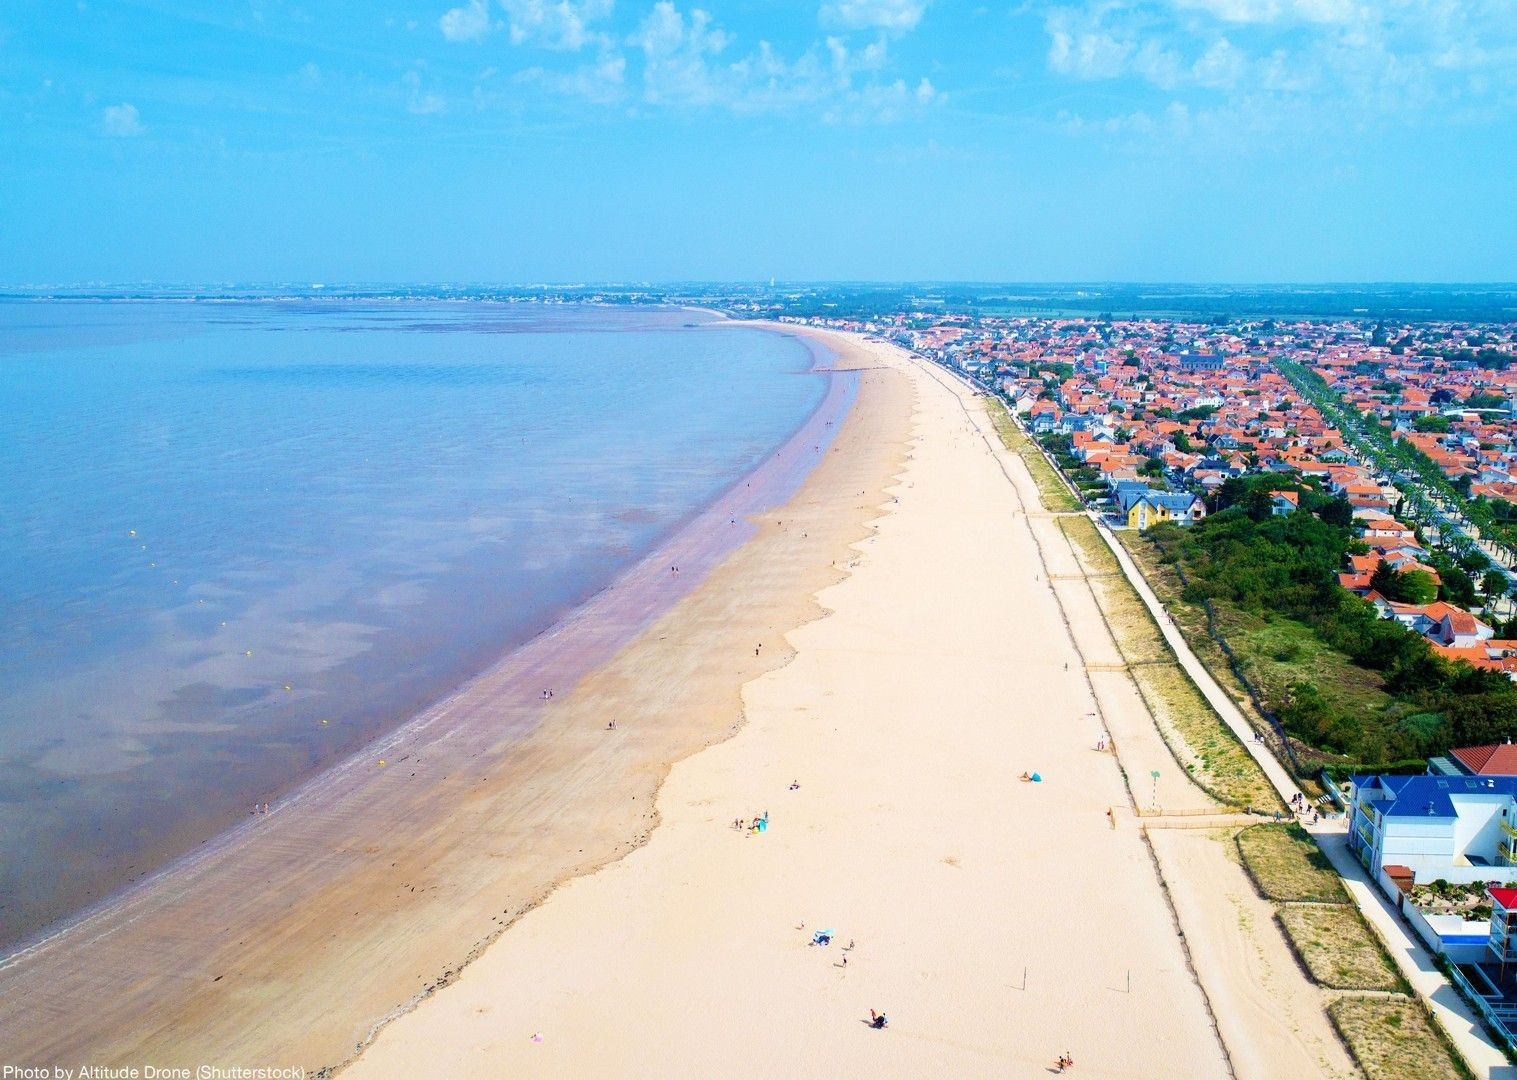 france-coast-family-biking-beach.jpg - NEW! France - Beach Odyssey - Family Cycling